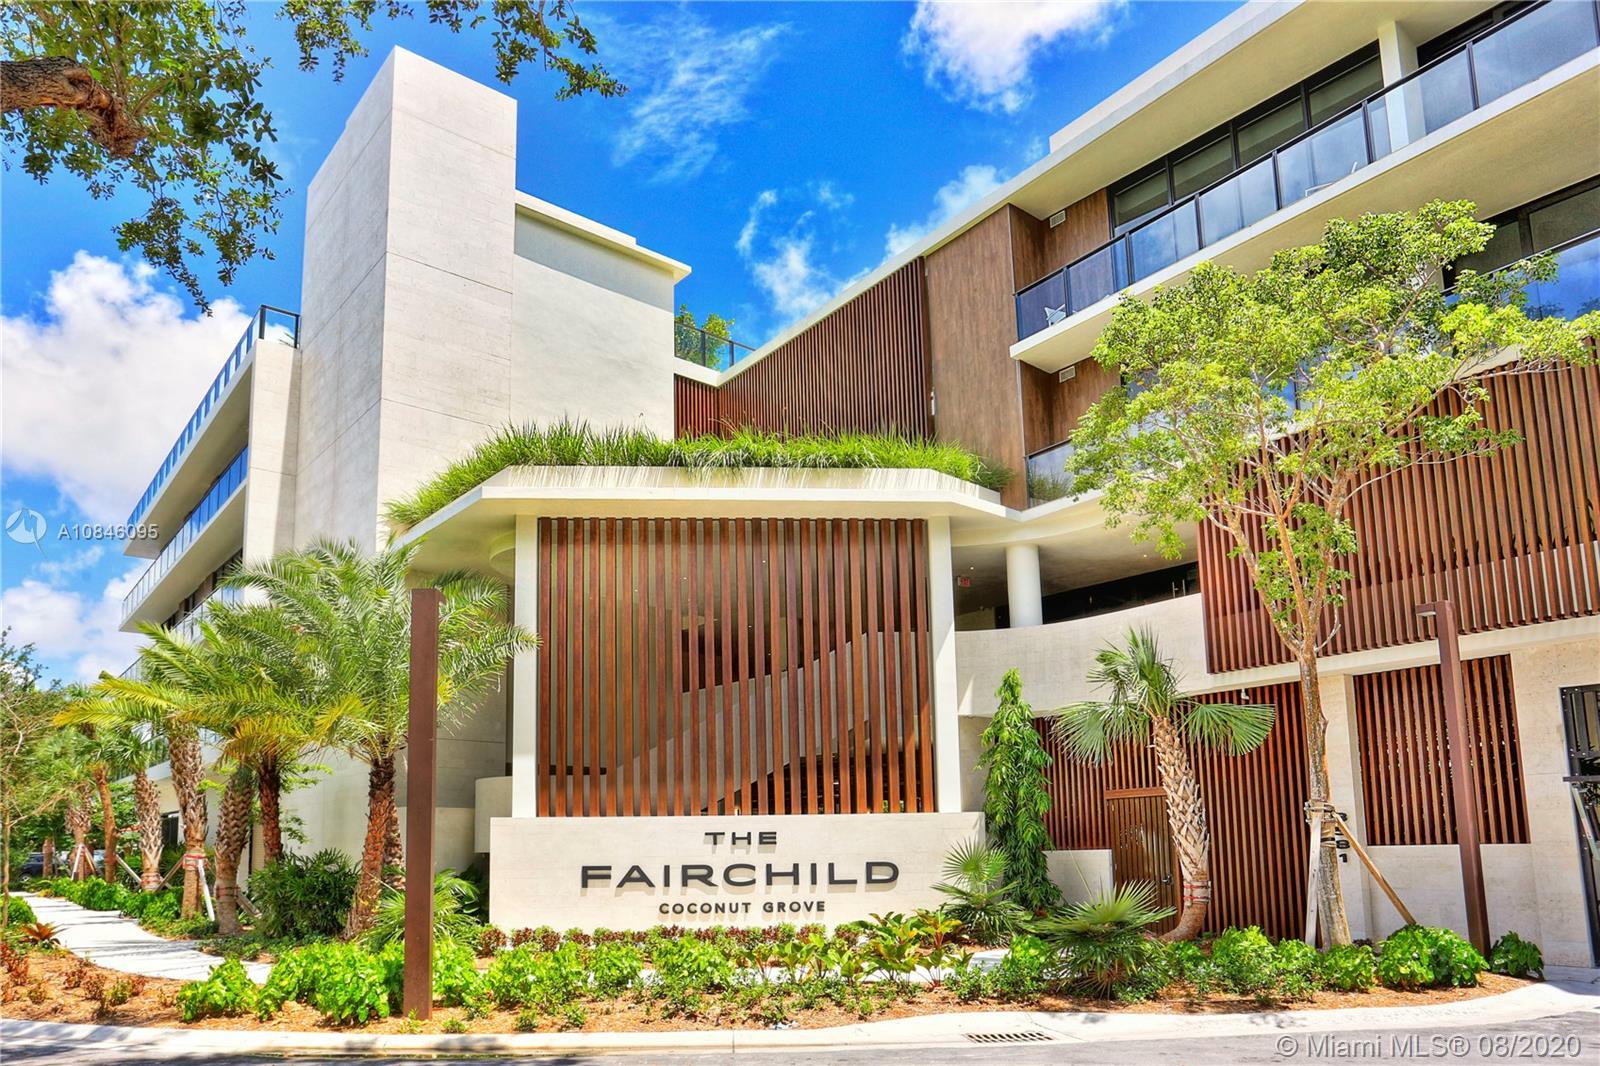 3581 E Glencoe St # 203, Coconut Grove, Florida 33133, 3 Bedrooms Bedrooms, 1 Room Rooms,5 BathroomsBathrooms,Residential,For Sale,3581 E Glencoe St # 203,A10846095